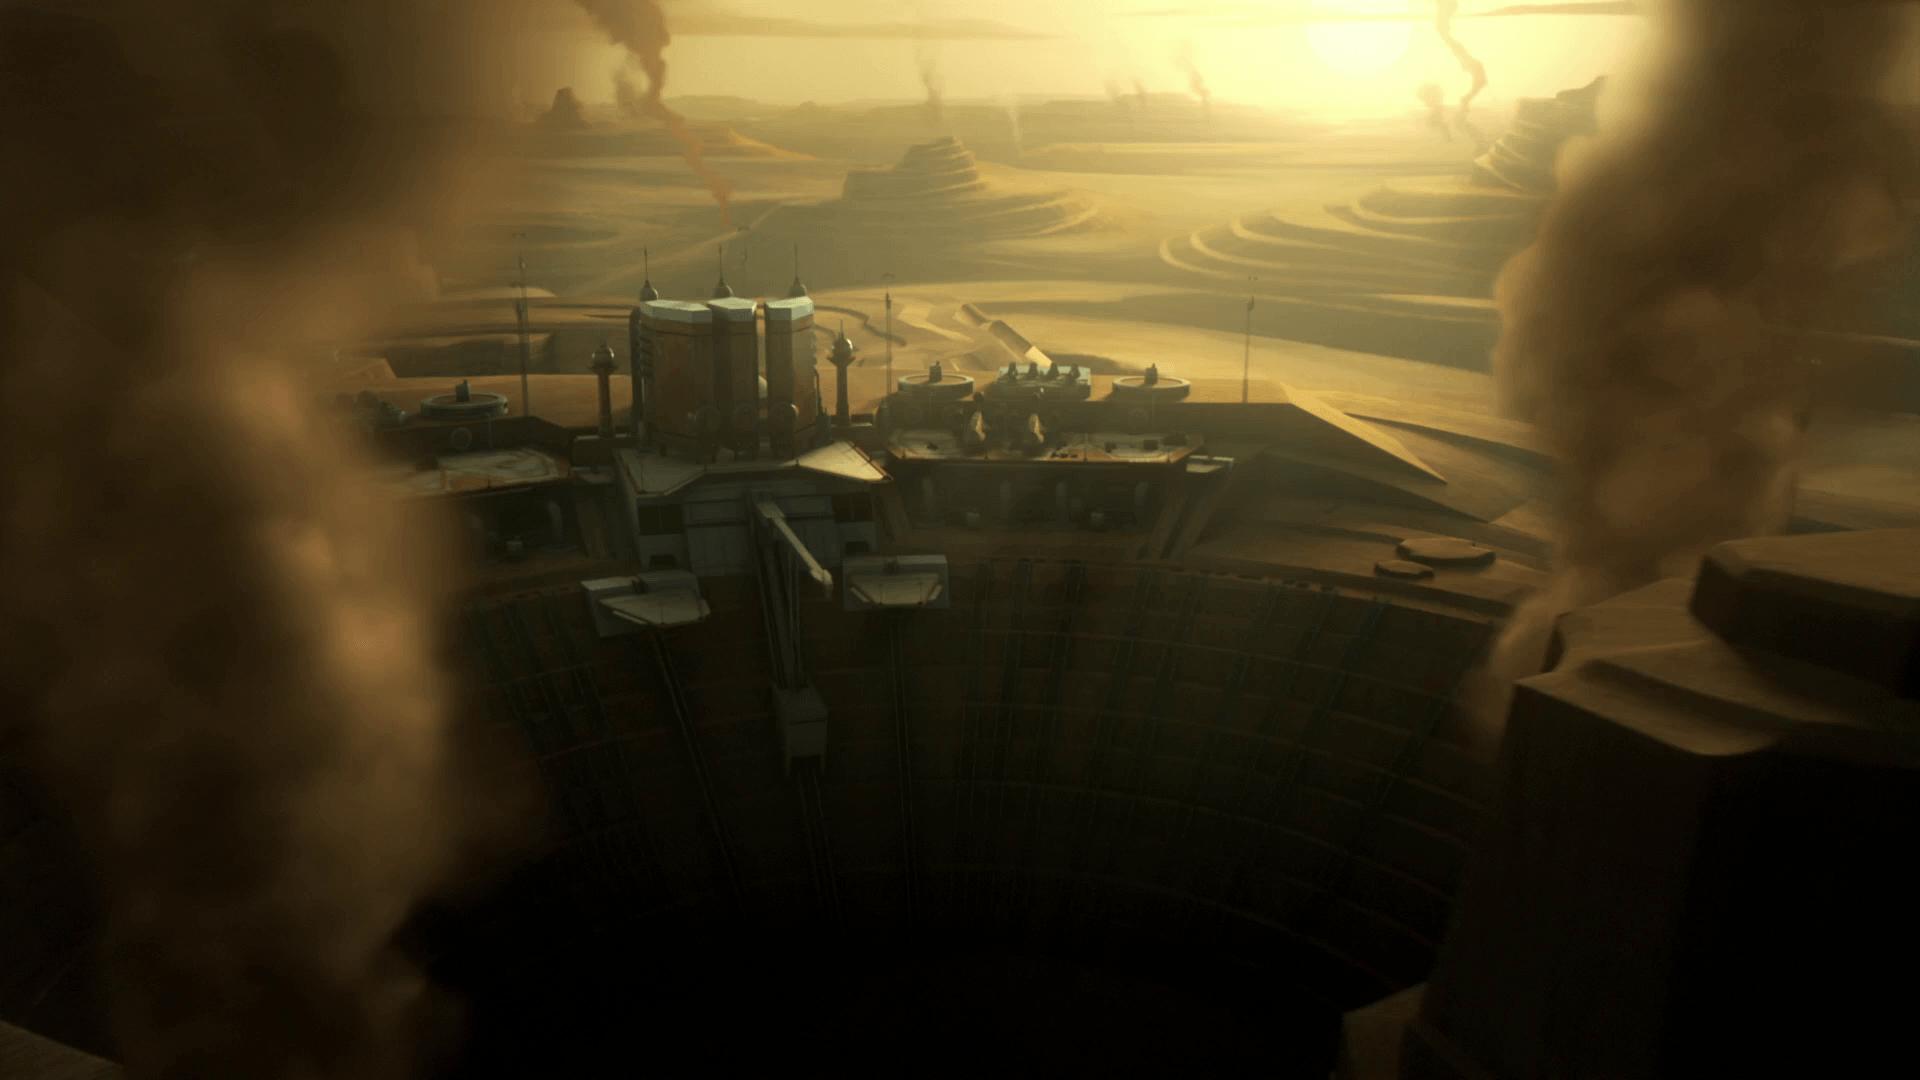 Kessel spice mines in Star Wars